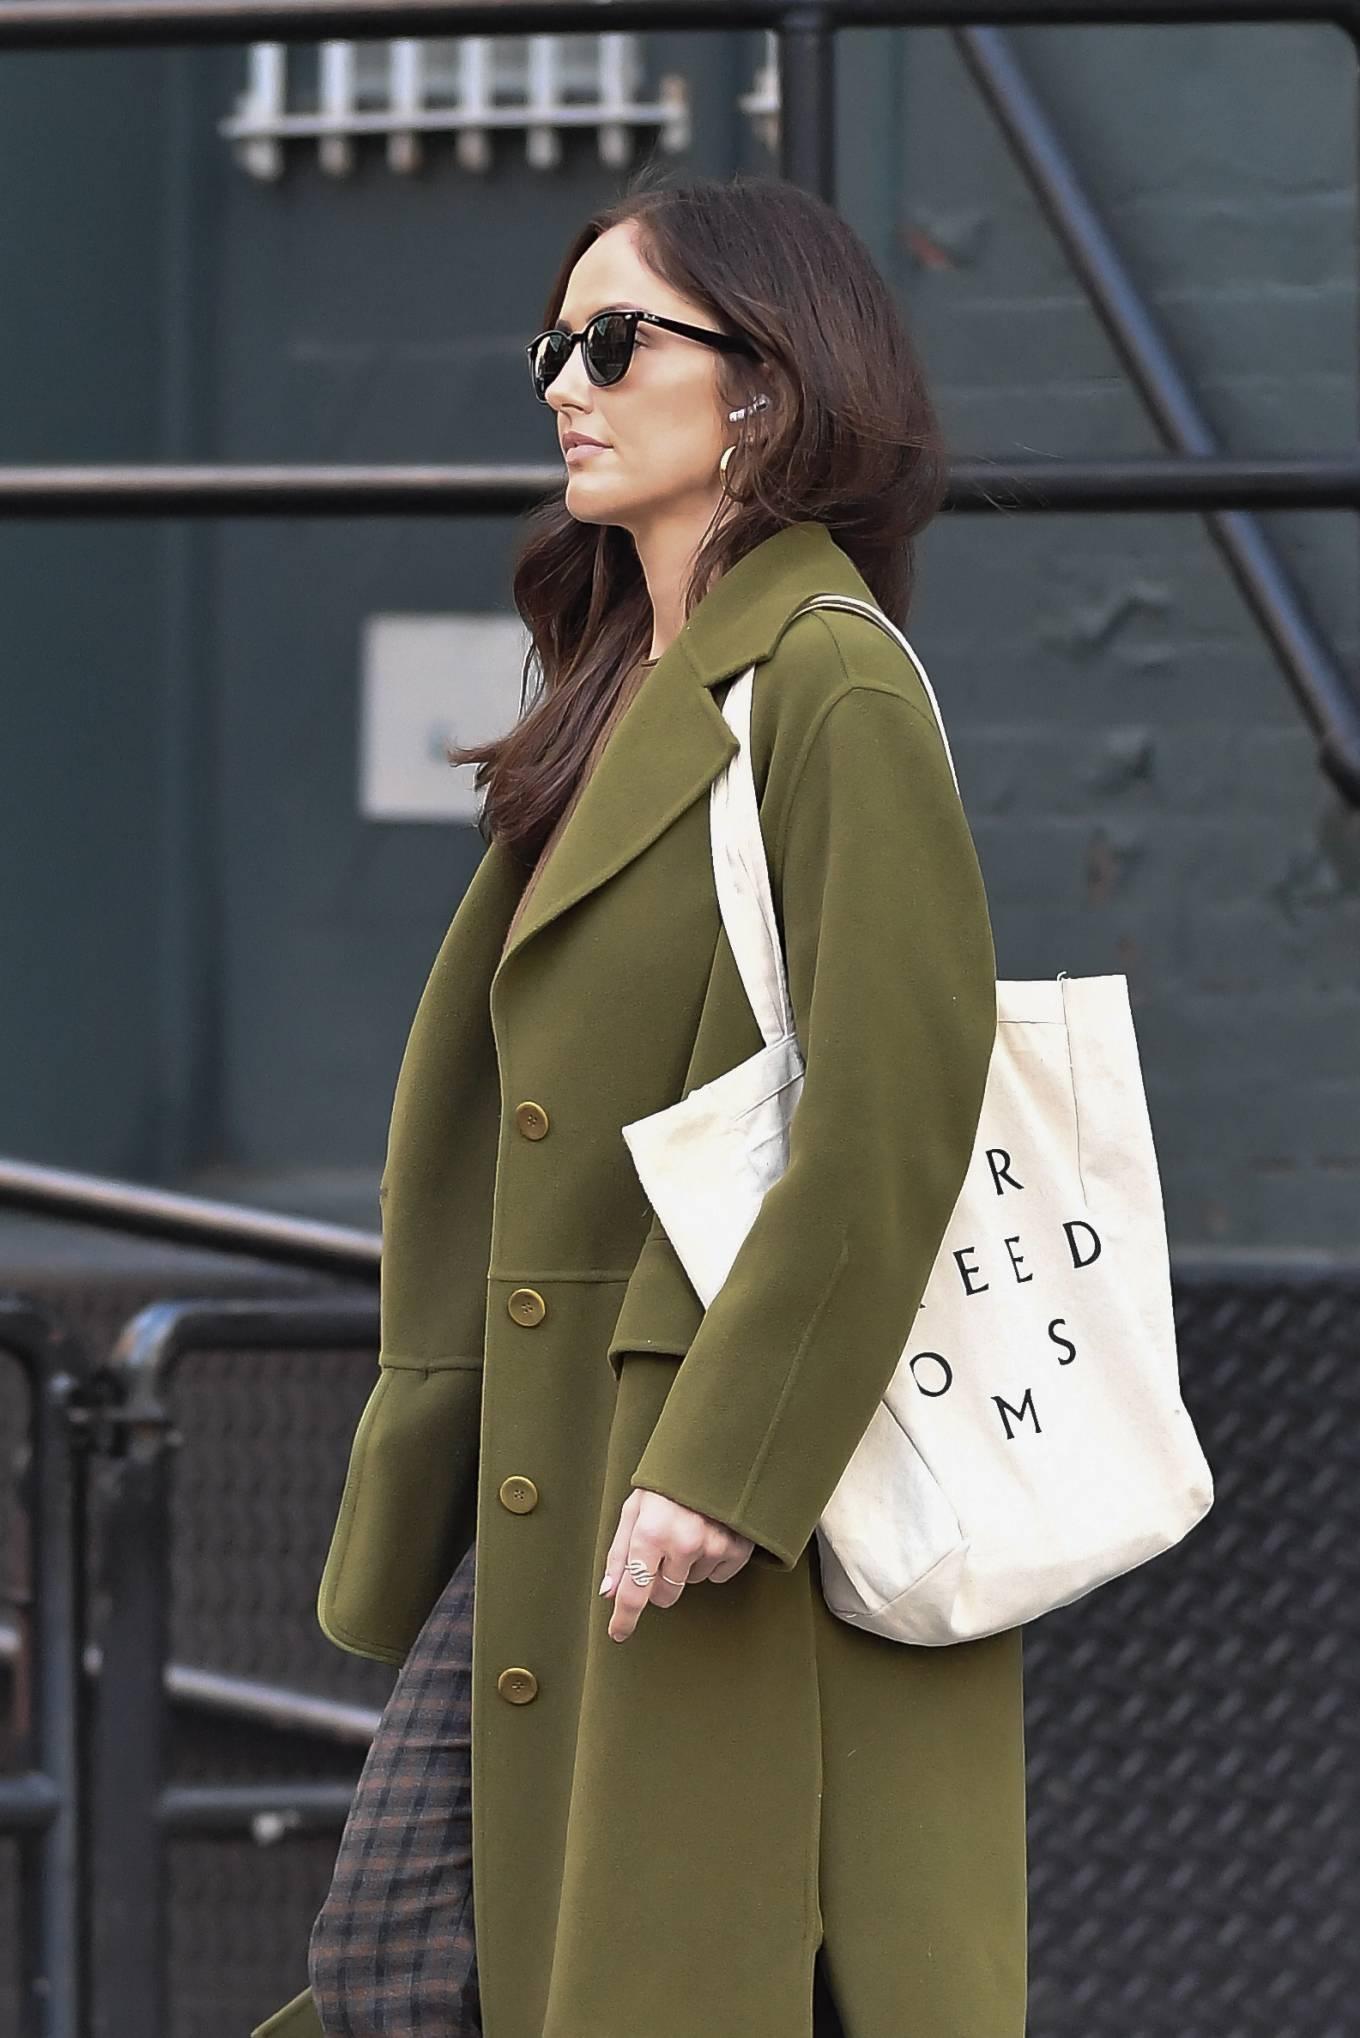 Minka Kelly 2021 : Minka Kelly – In olive green runs errands in New York-34